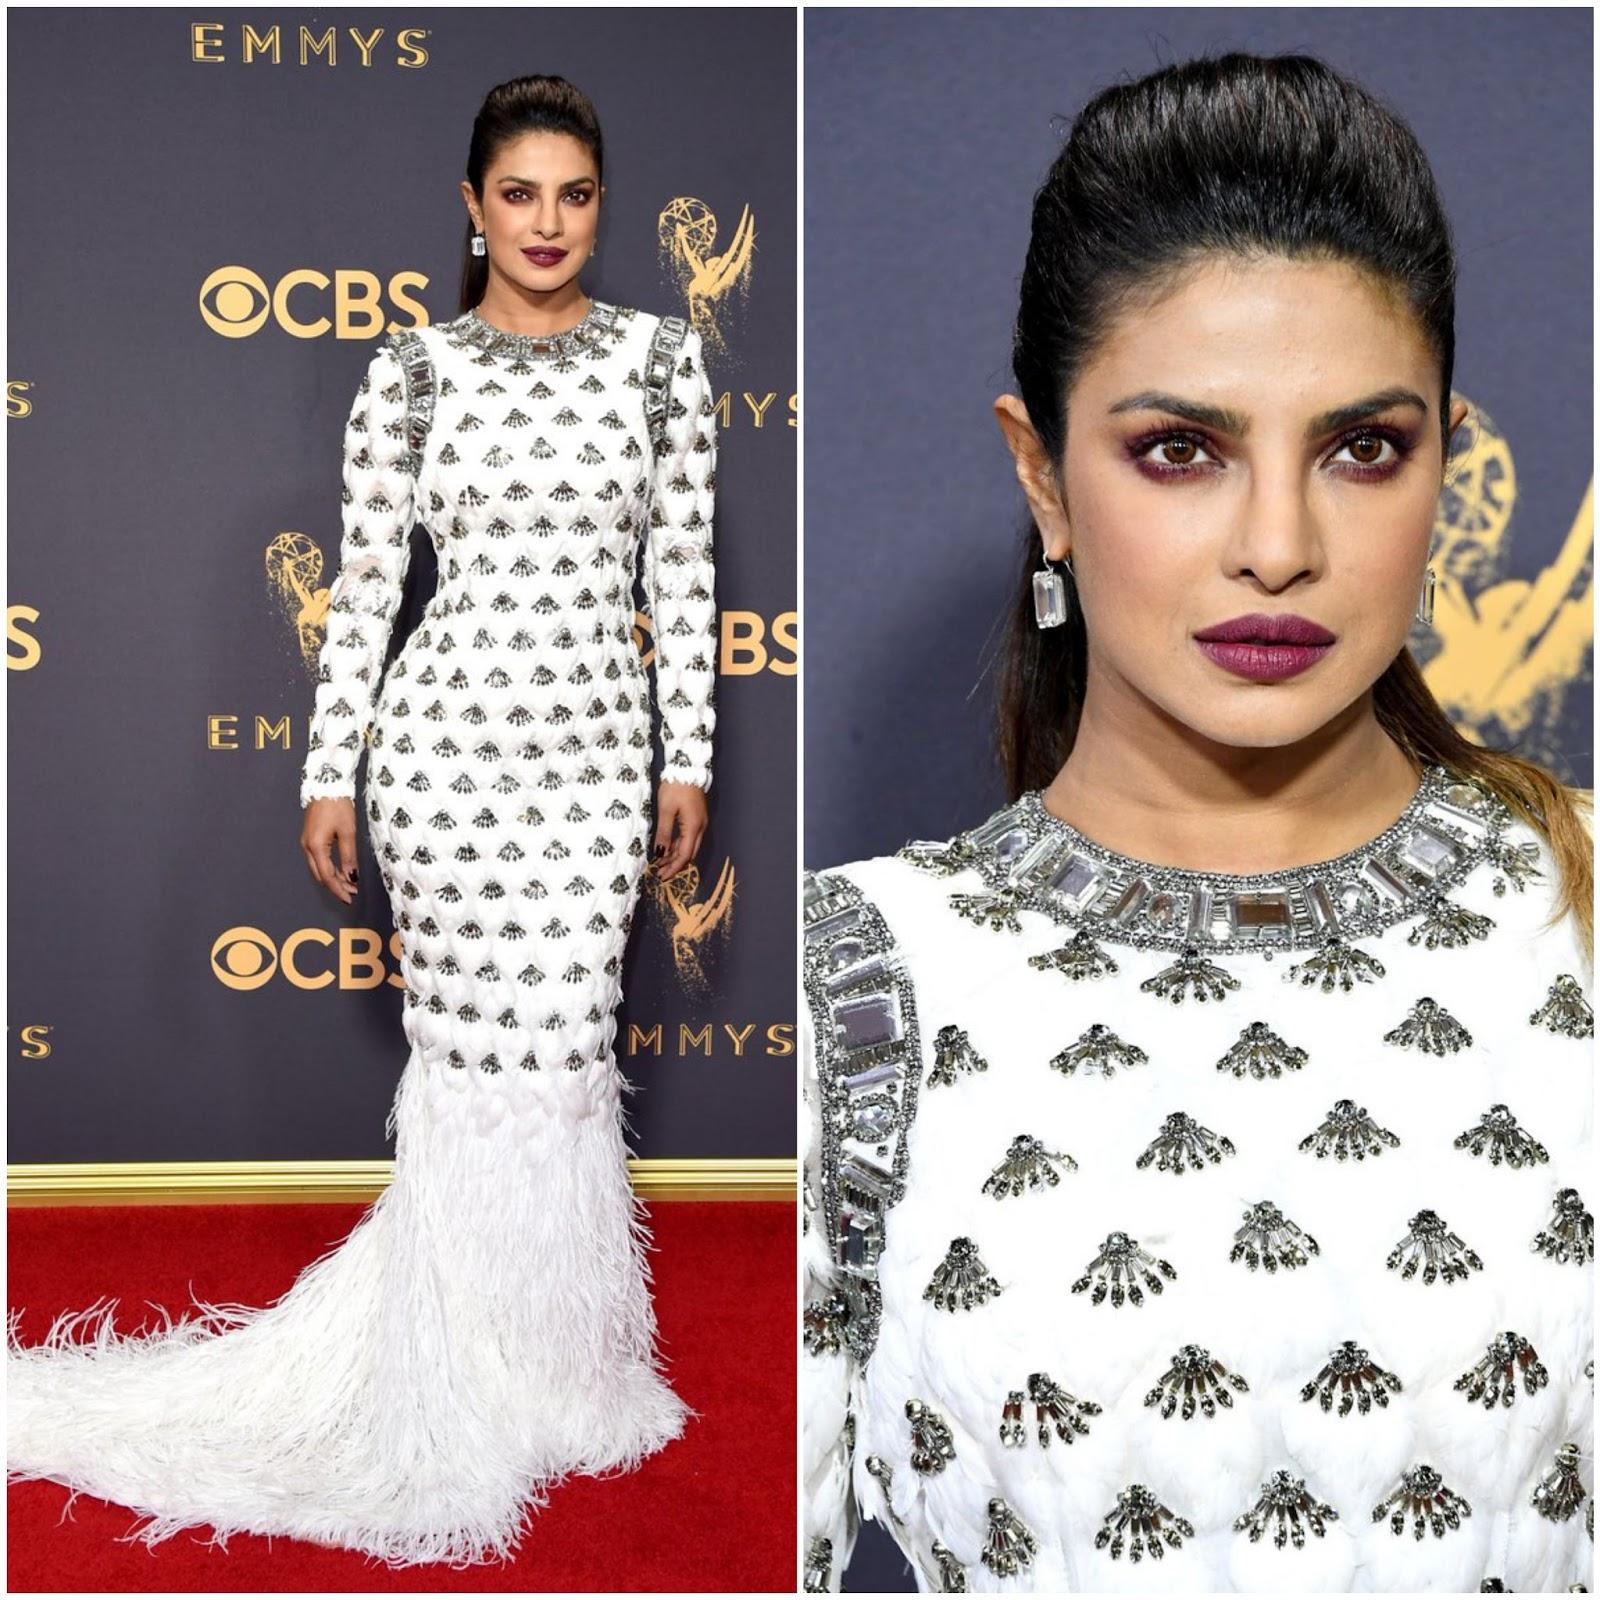 Primetime Emmy Awards 2017: Priyanka Chopra In Balmain